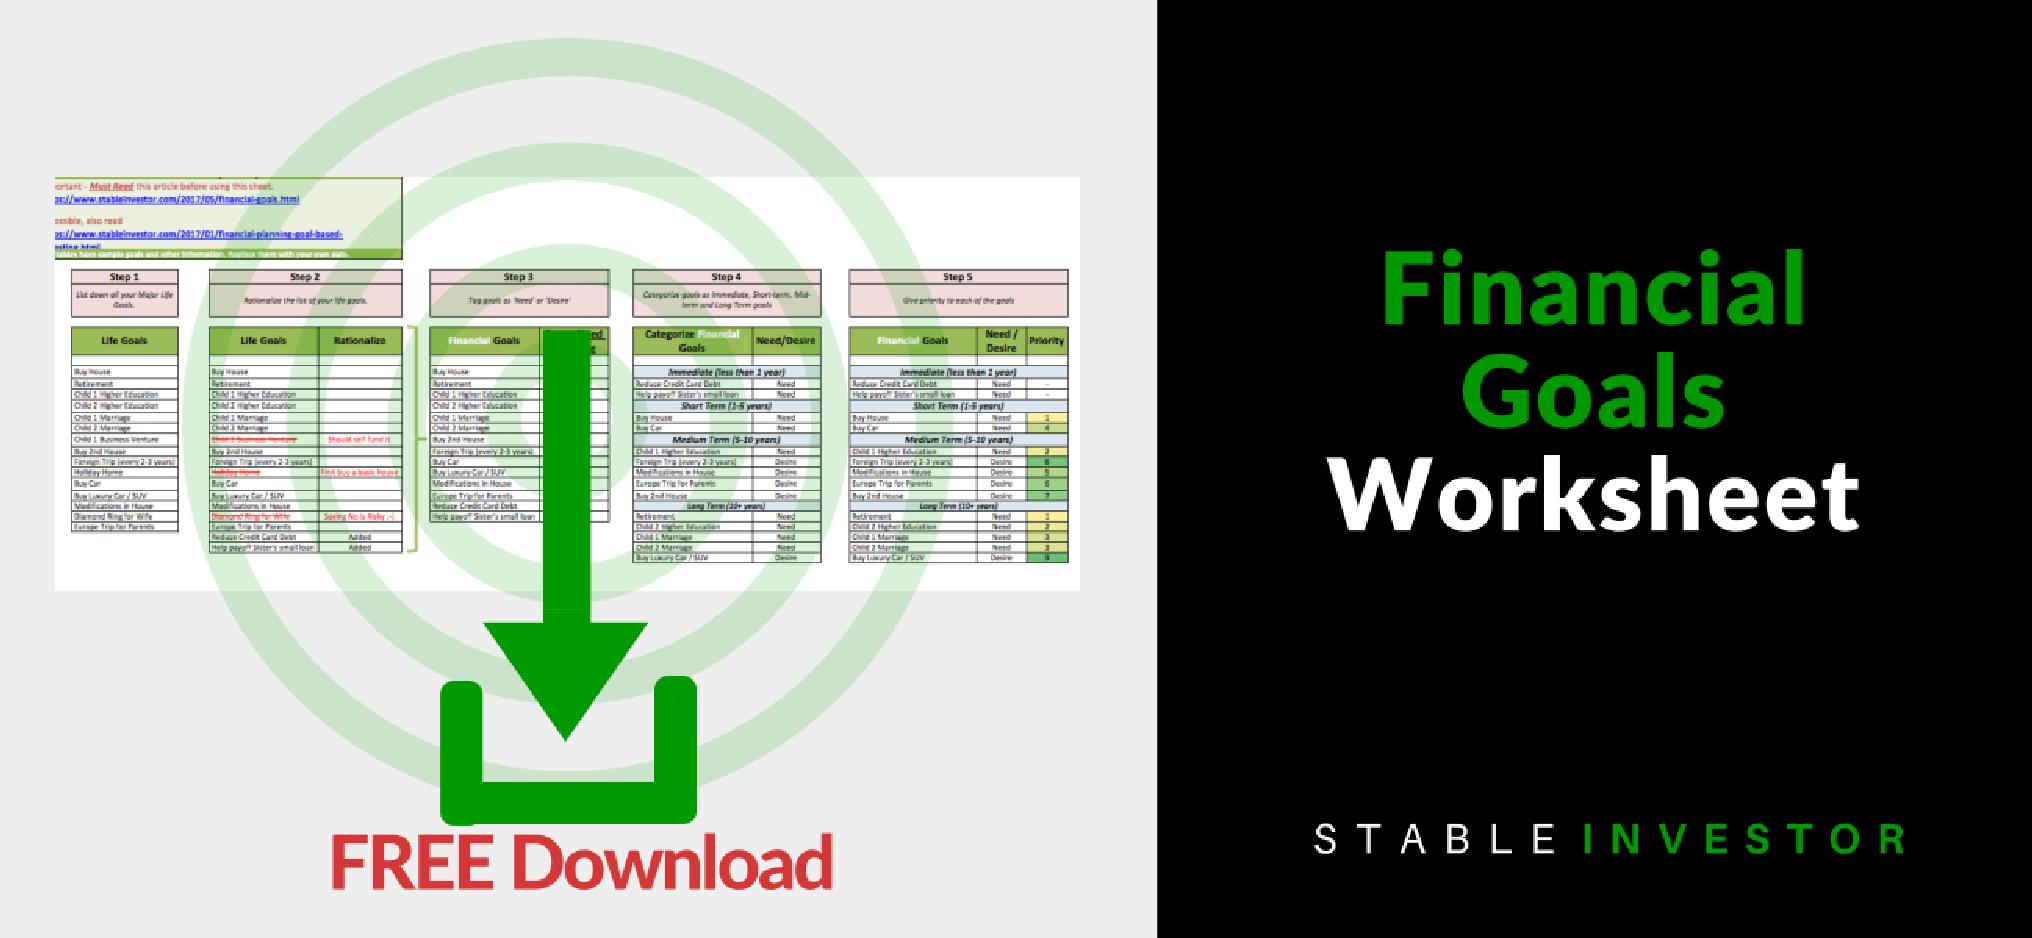 FREE Download Financial Goal Planning Excel Worksheet Stable Investor